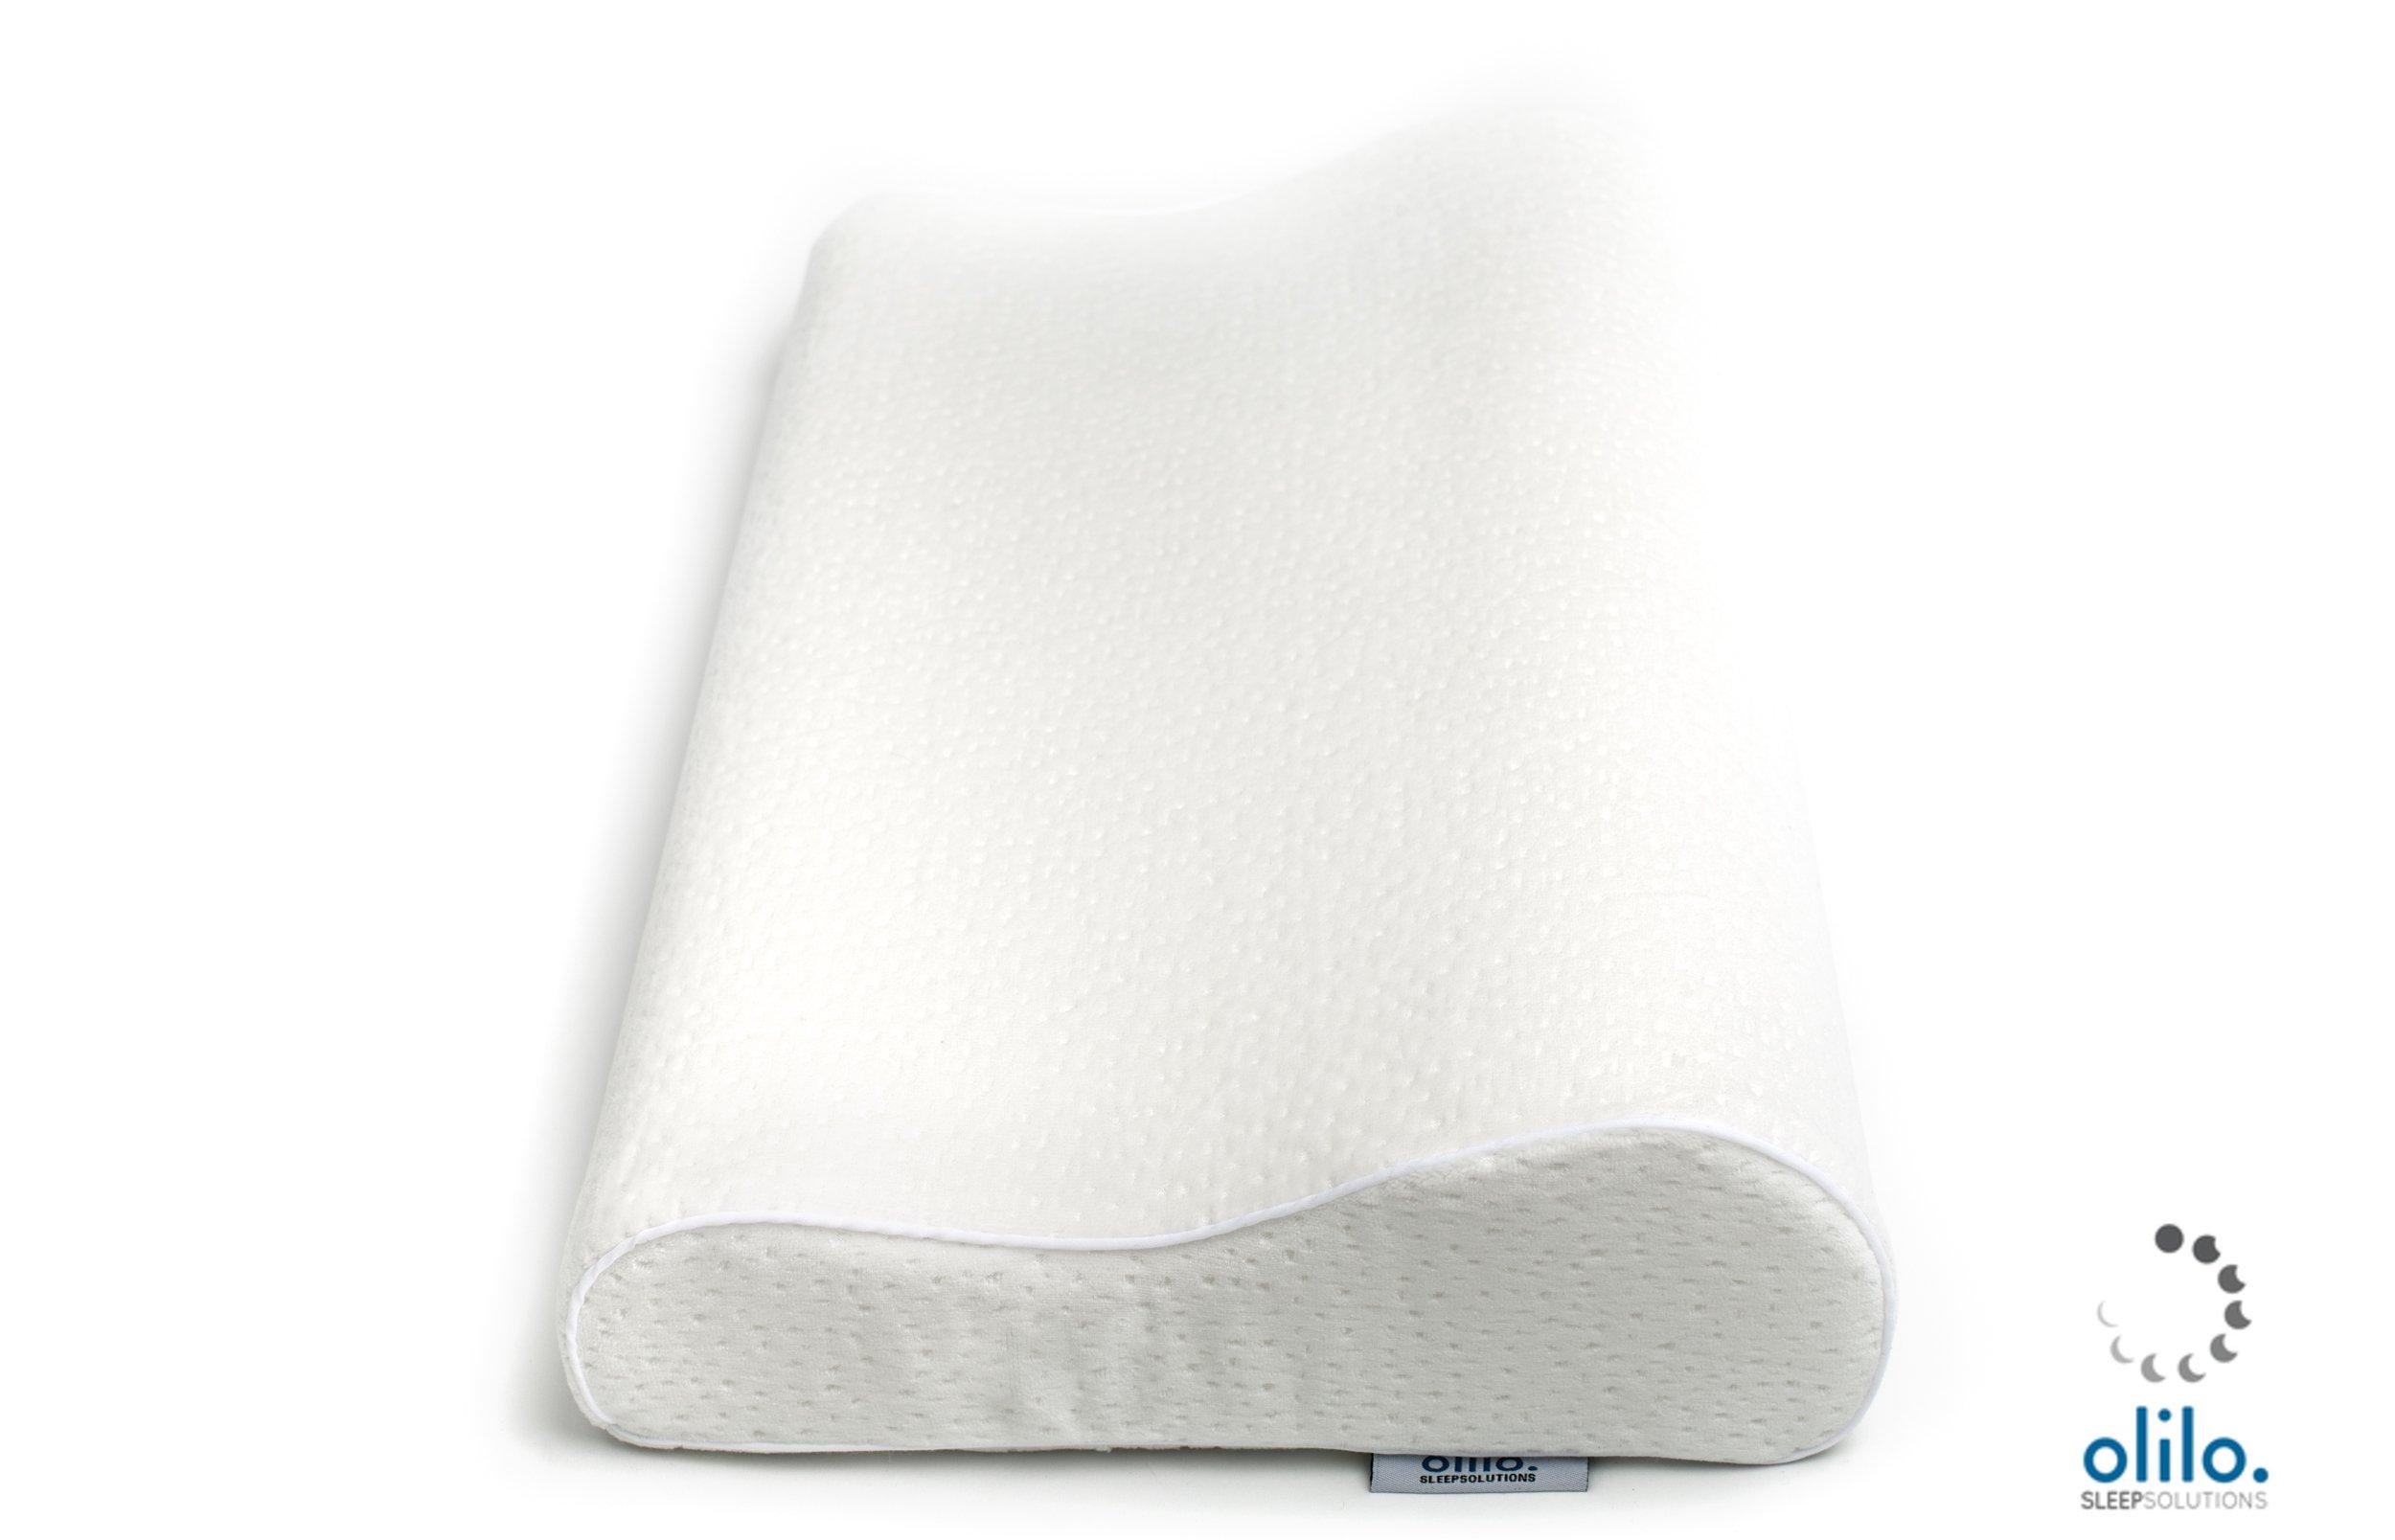 Olilo Sleep Solutions Contour German Engineered Memory Foam Pillow (Queen Soft)